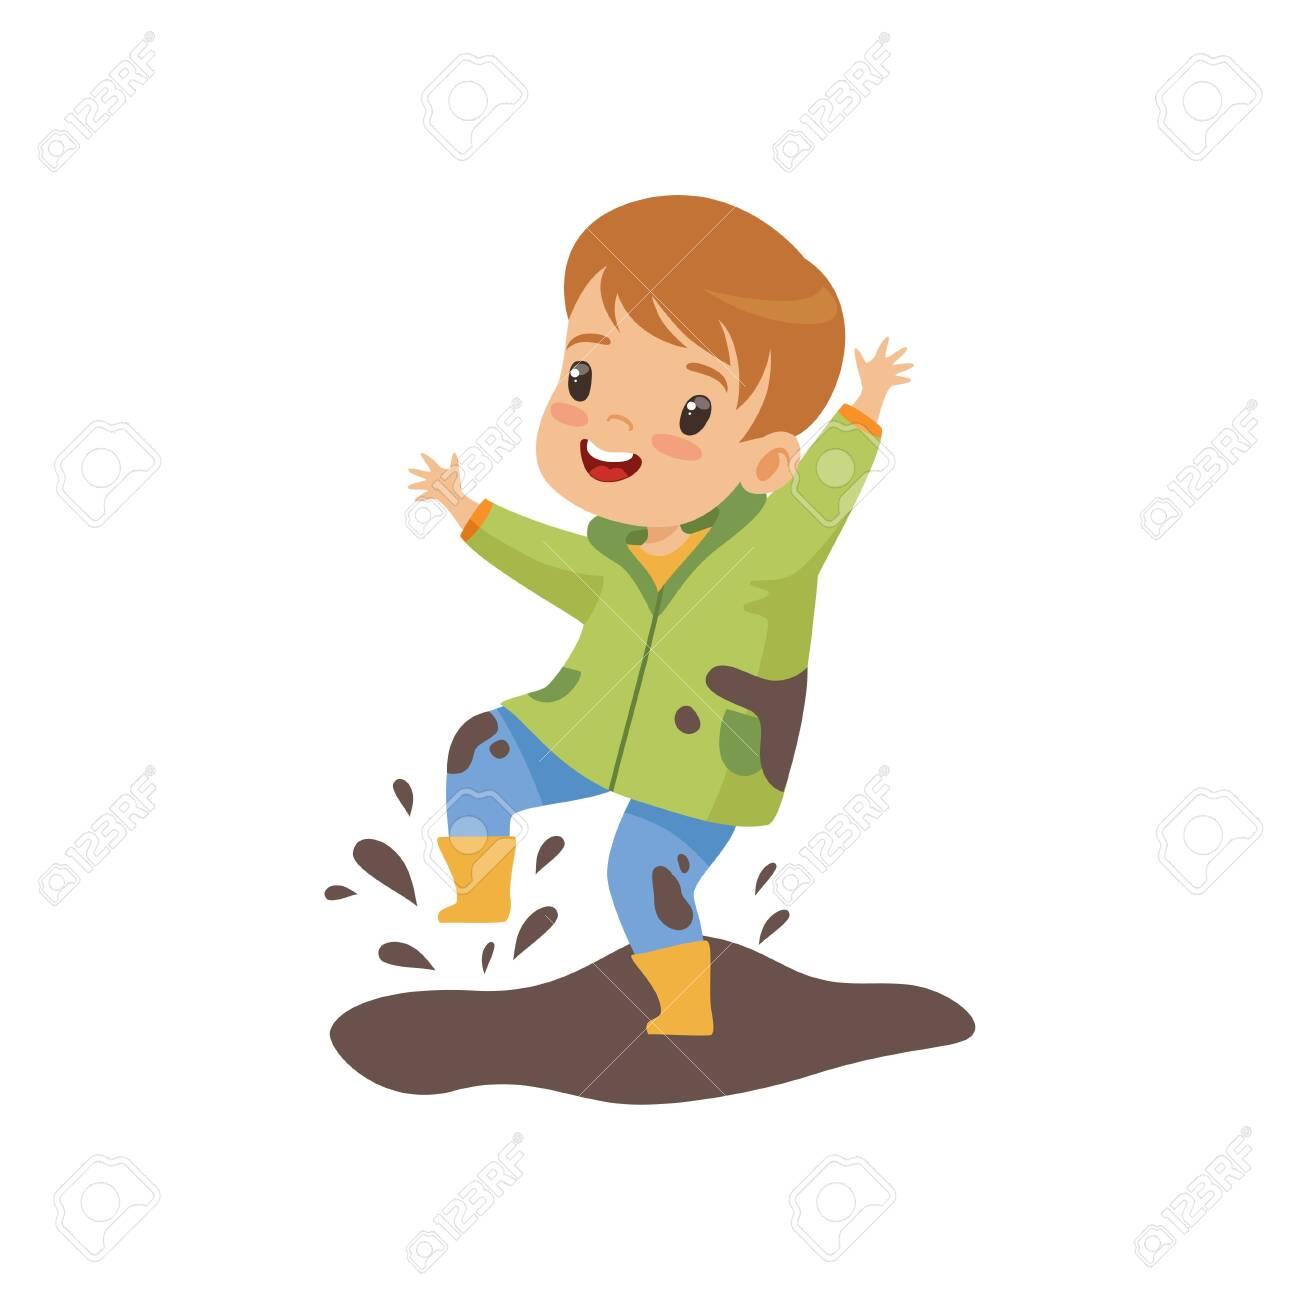 Cute Boy Jumping in Dirt, Naughty Kid, Bad Child Behavior Vector Illustration on White Background. - 124296986